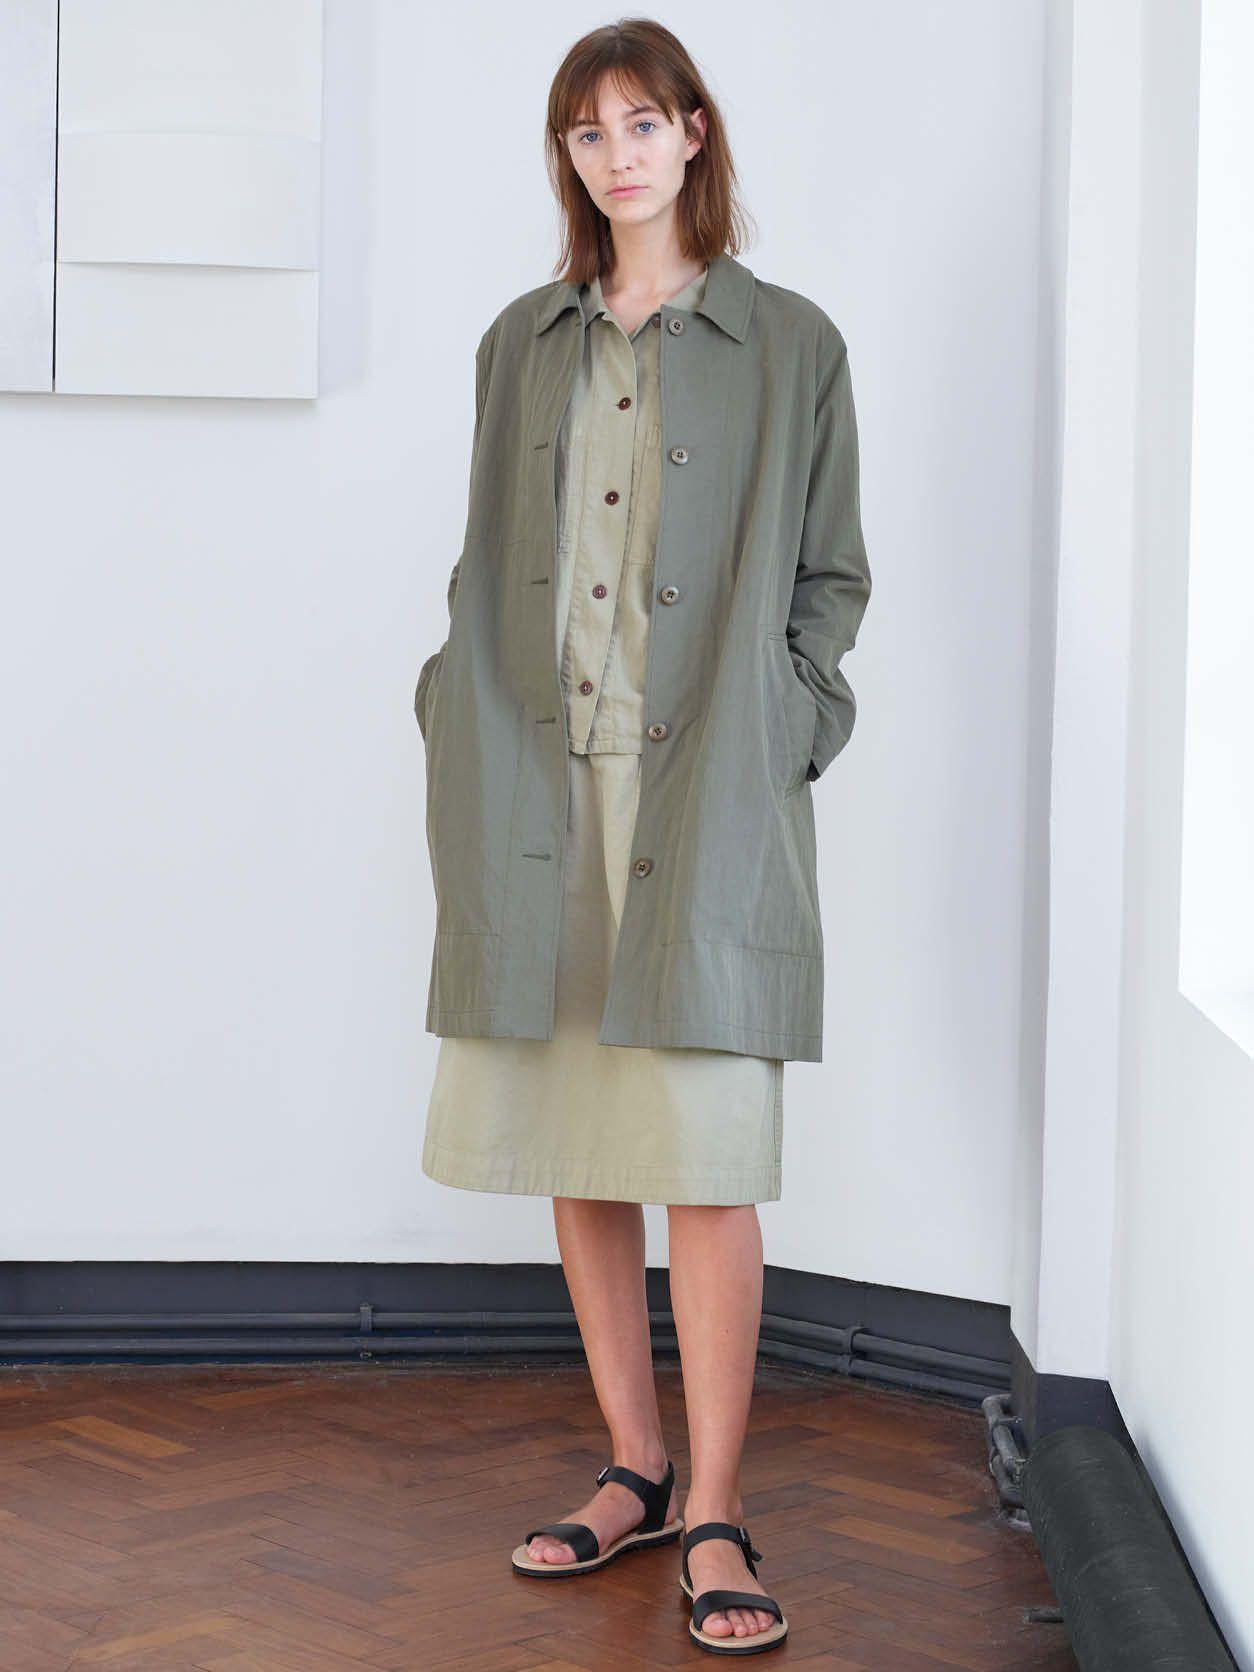 Lookbook | Greedy Eyes | Margaret howell, Work shirts, Fashion